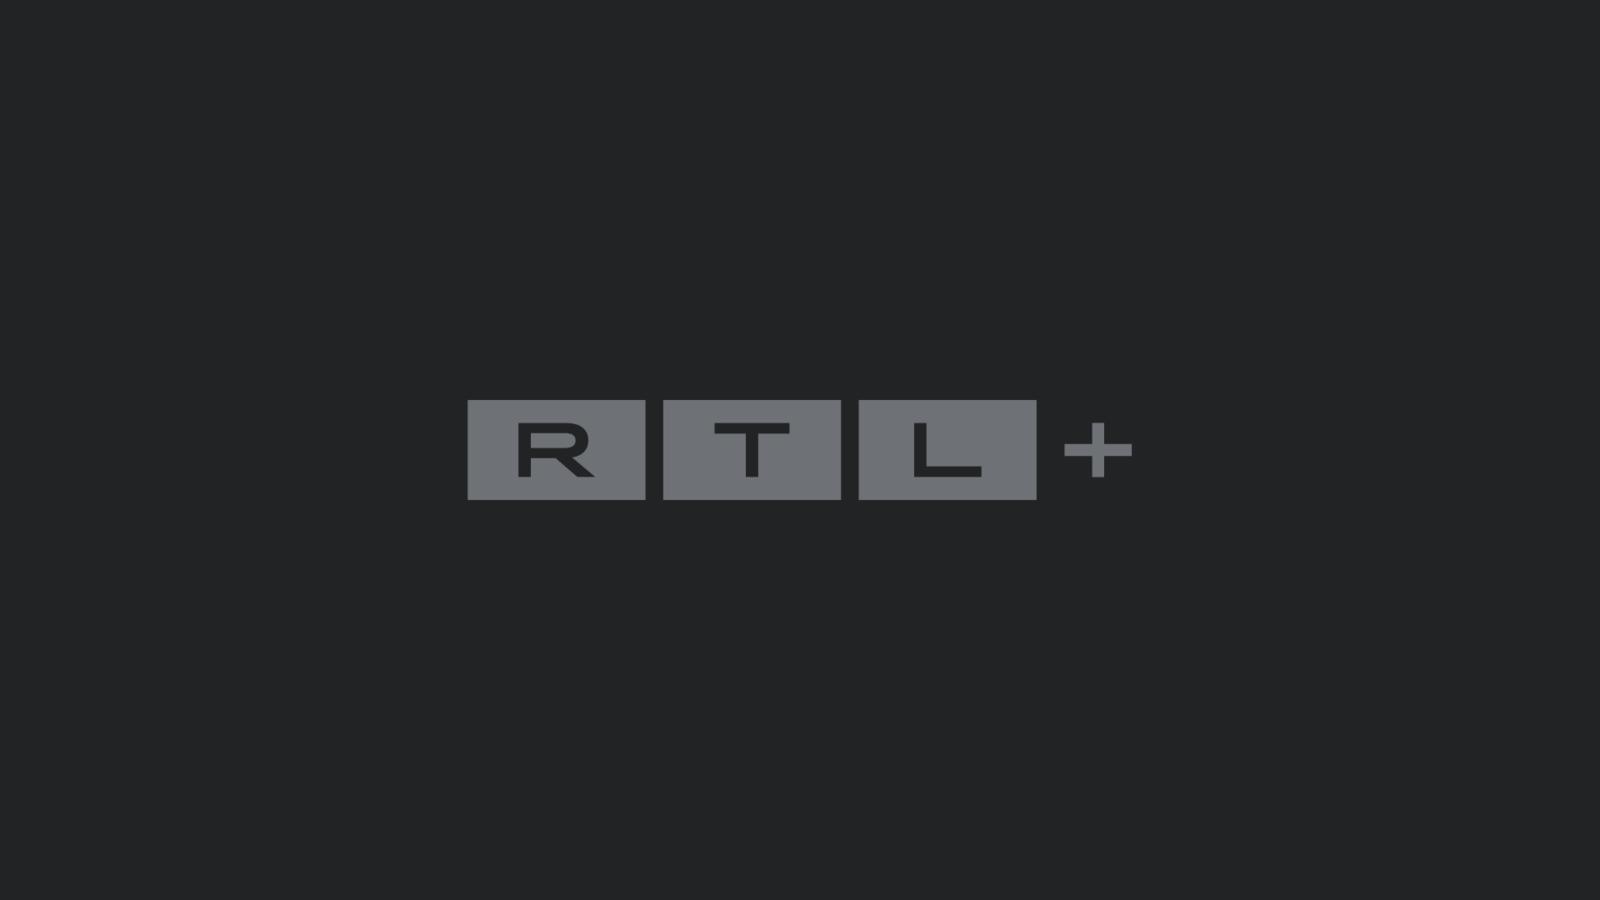 Rtl Nitro Born To Kill